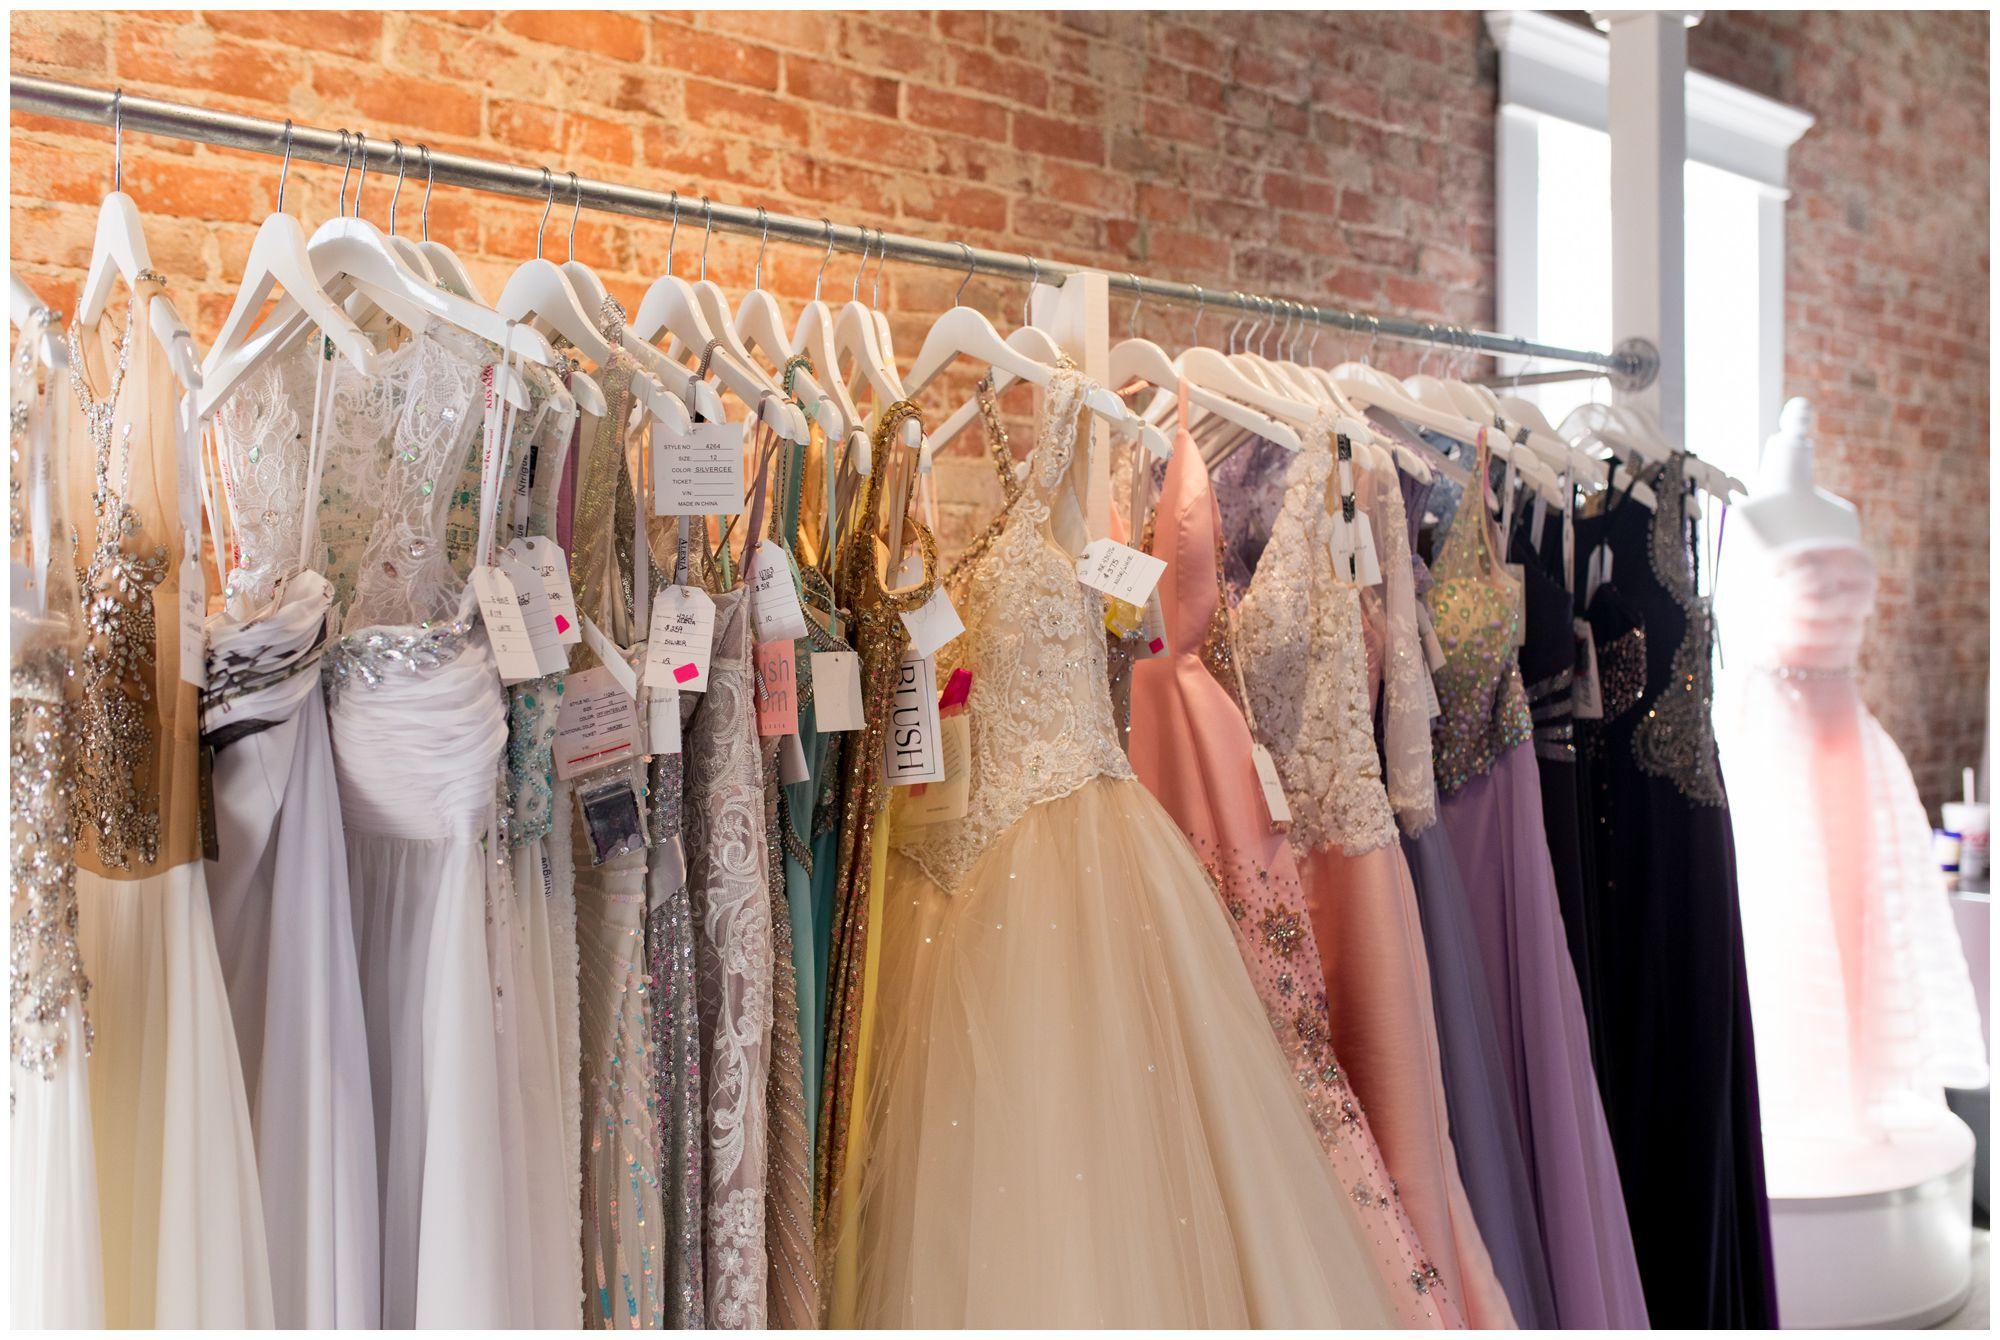 prom and formal dresses at Blye's Bridal Loft in Kokomo Indiana